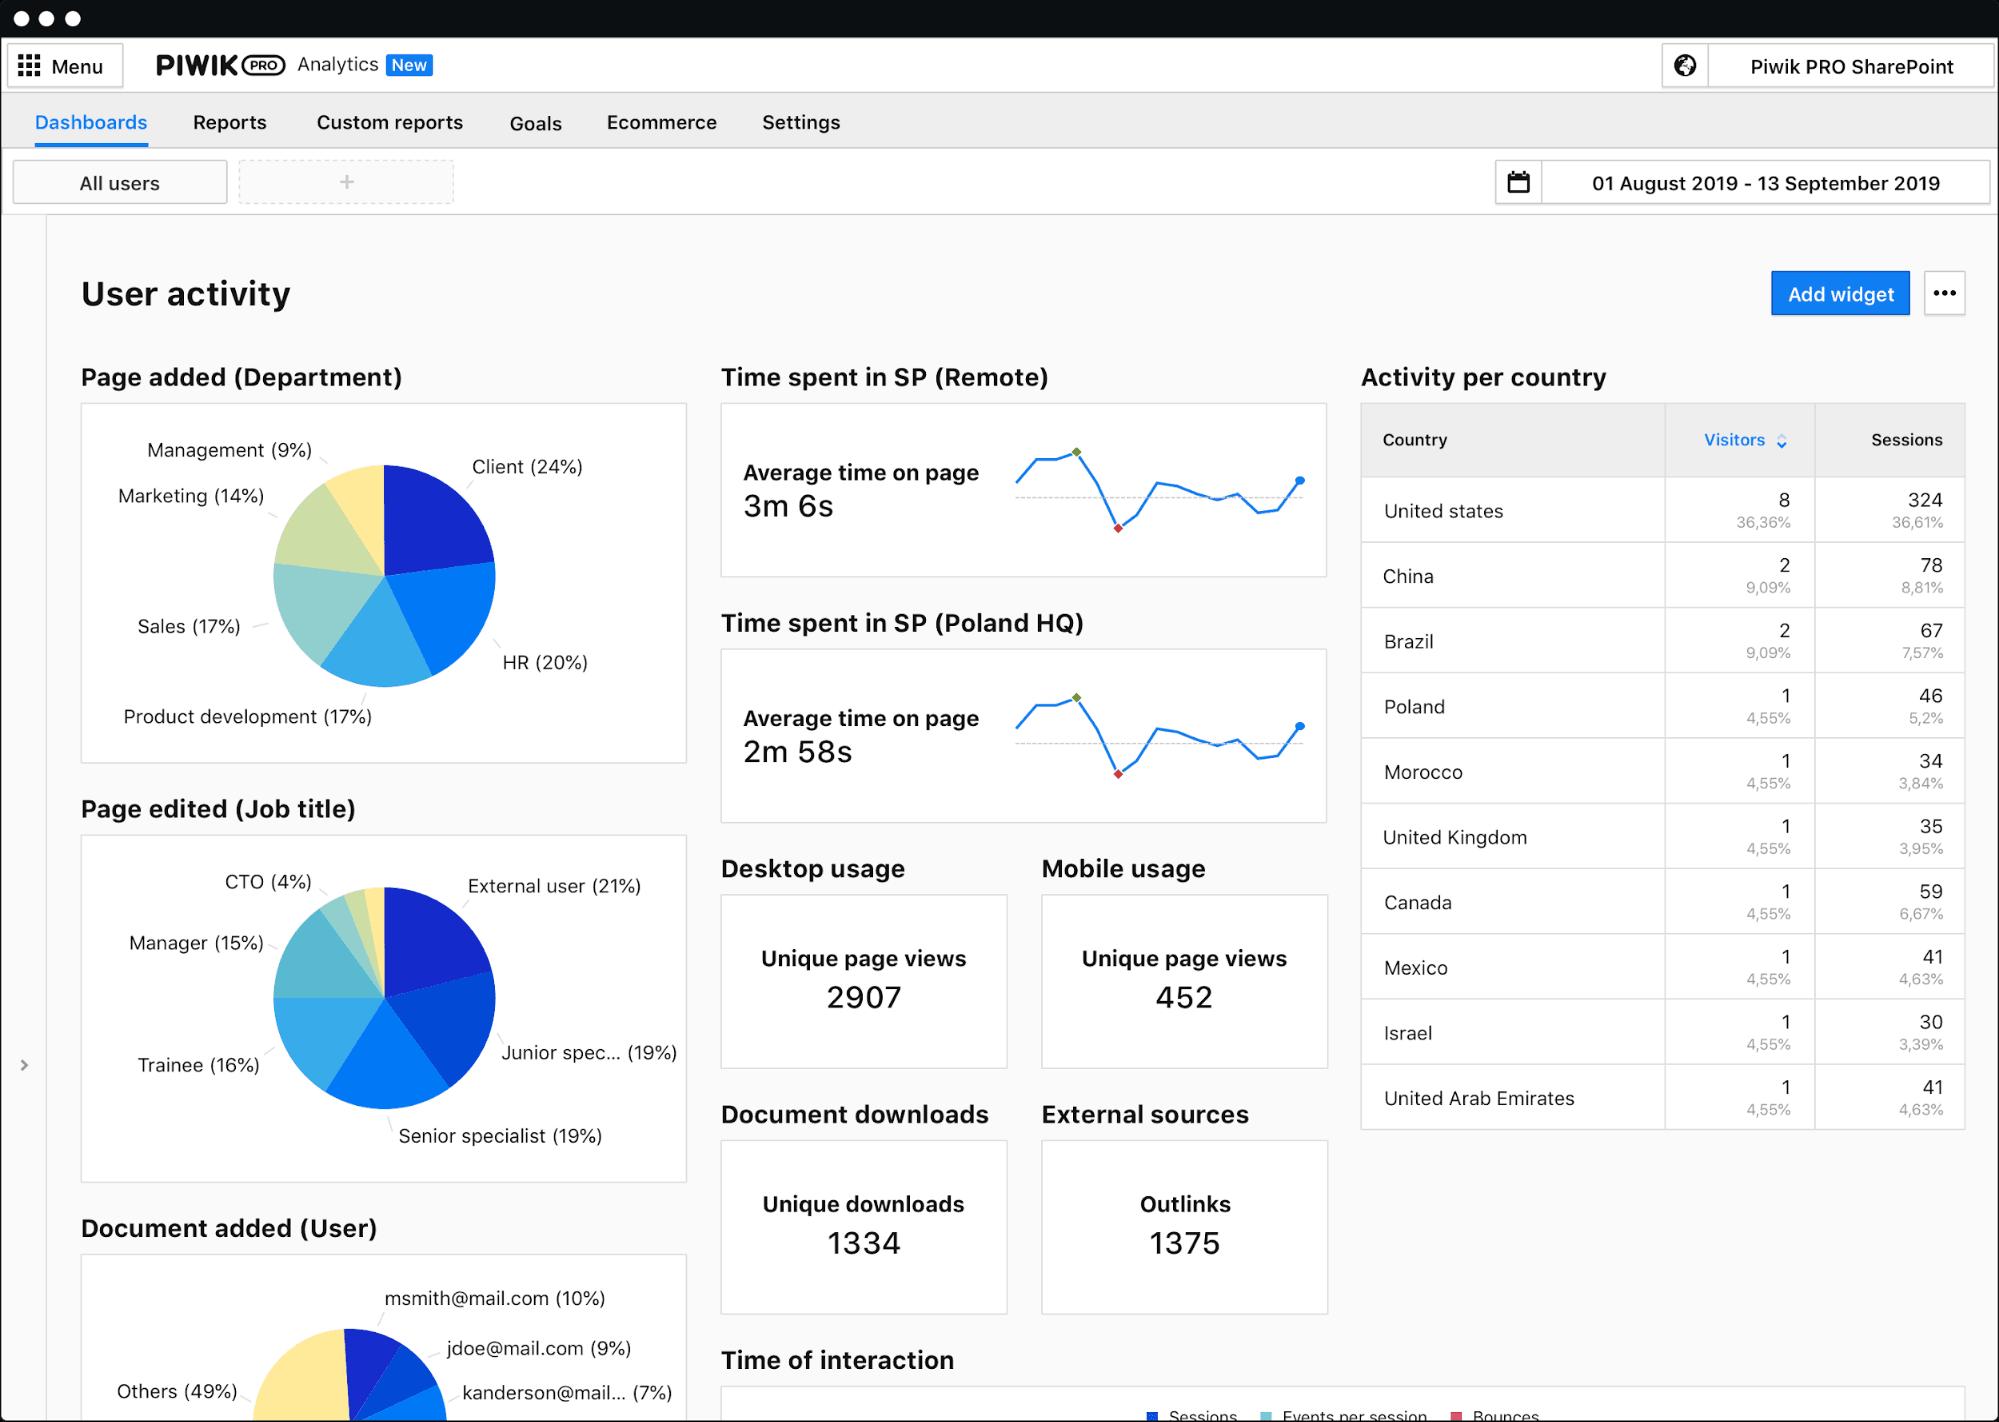 SharePoint analytics Piwik PRO